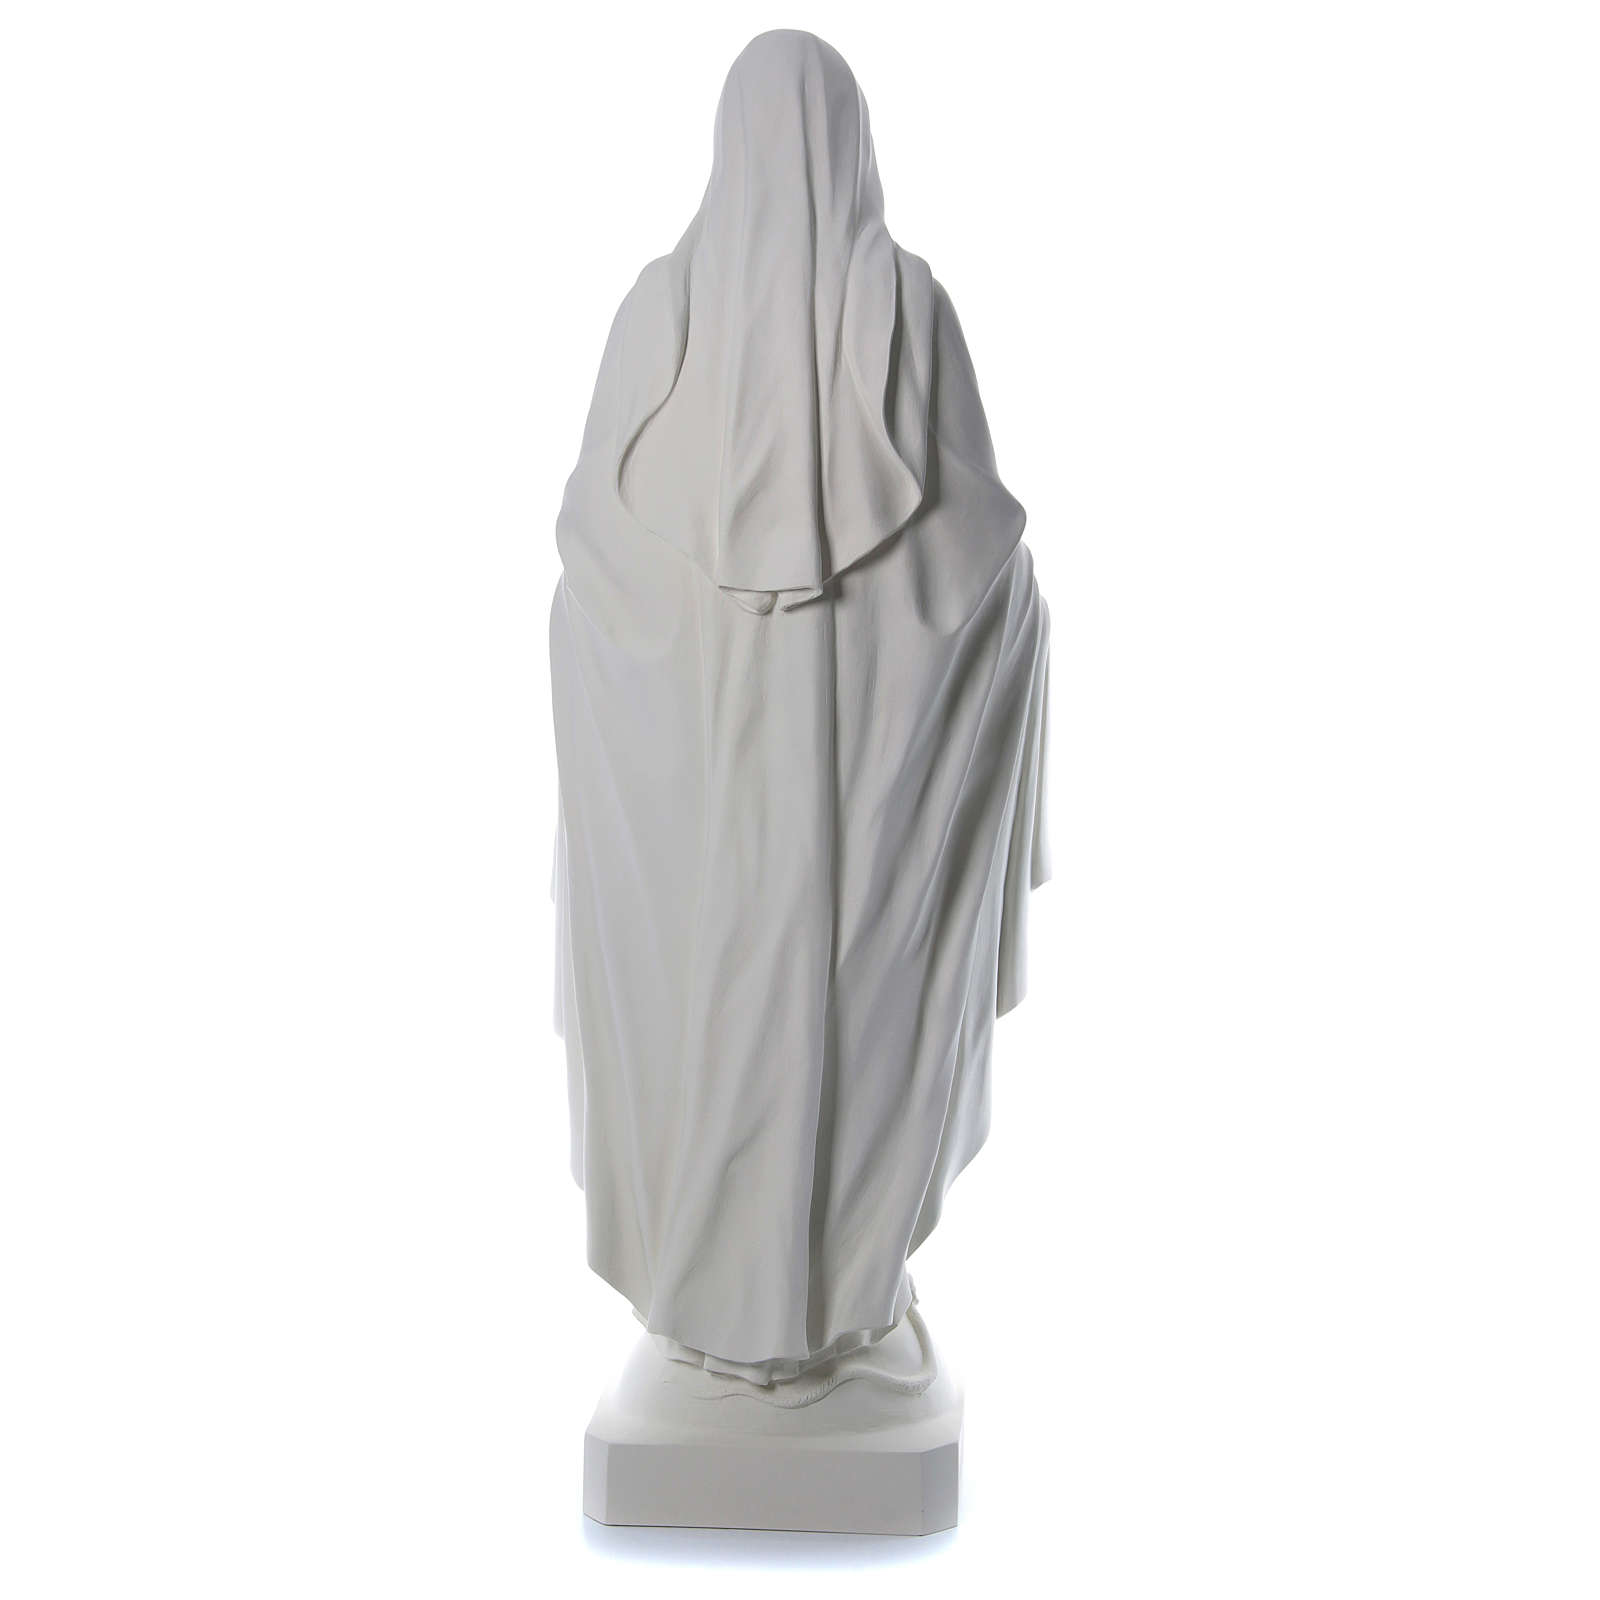 Immacolata 180 cm vetroresina bianca 4